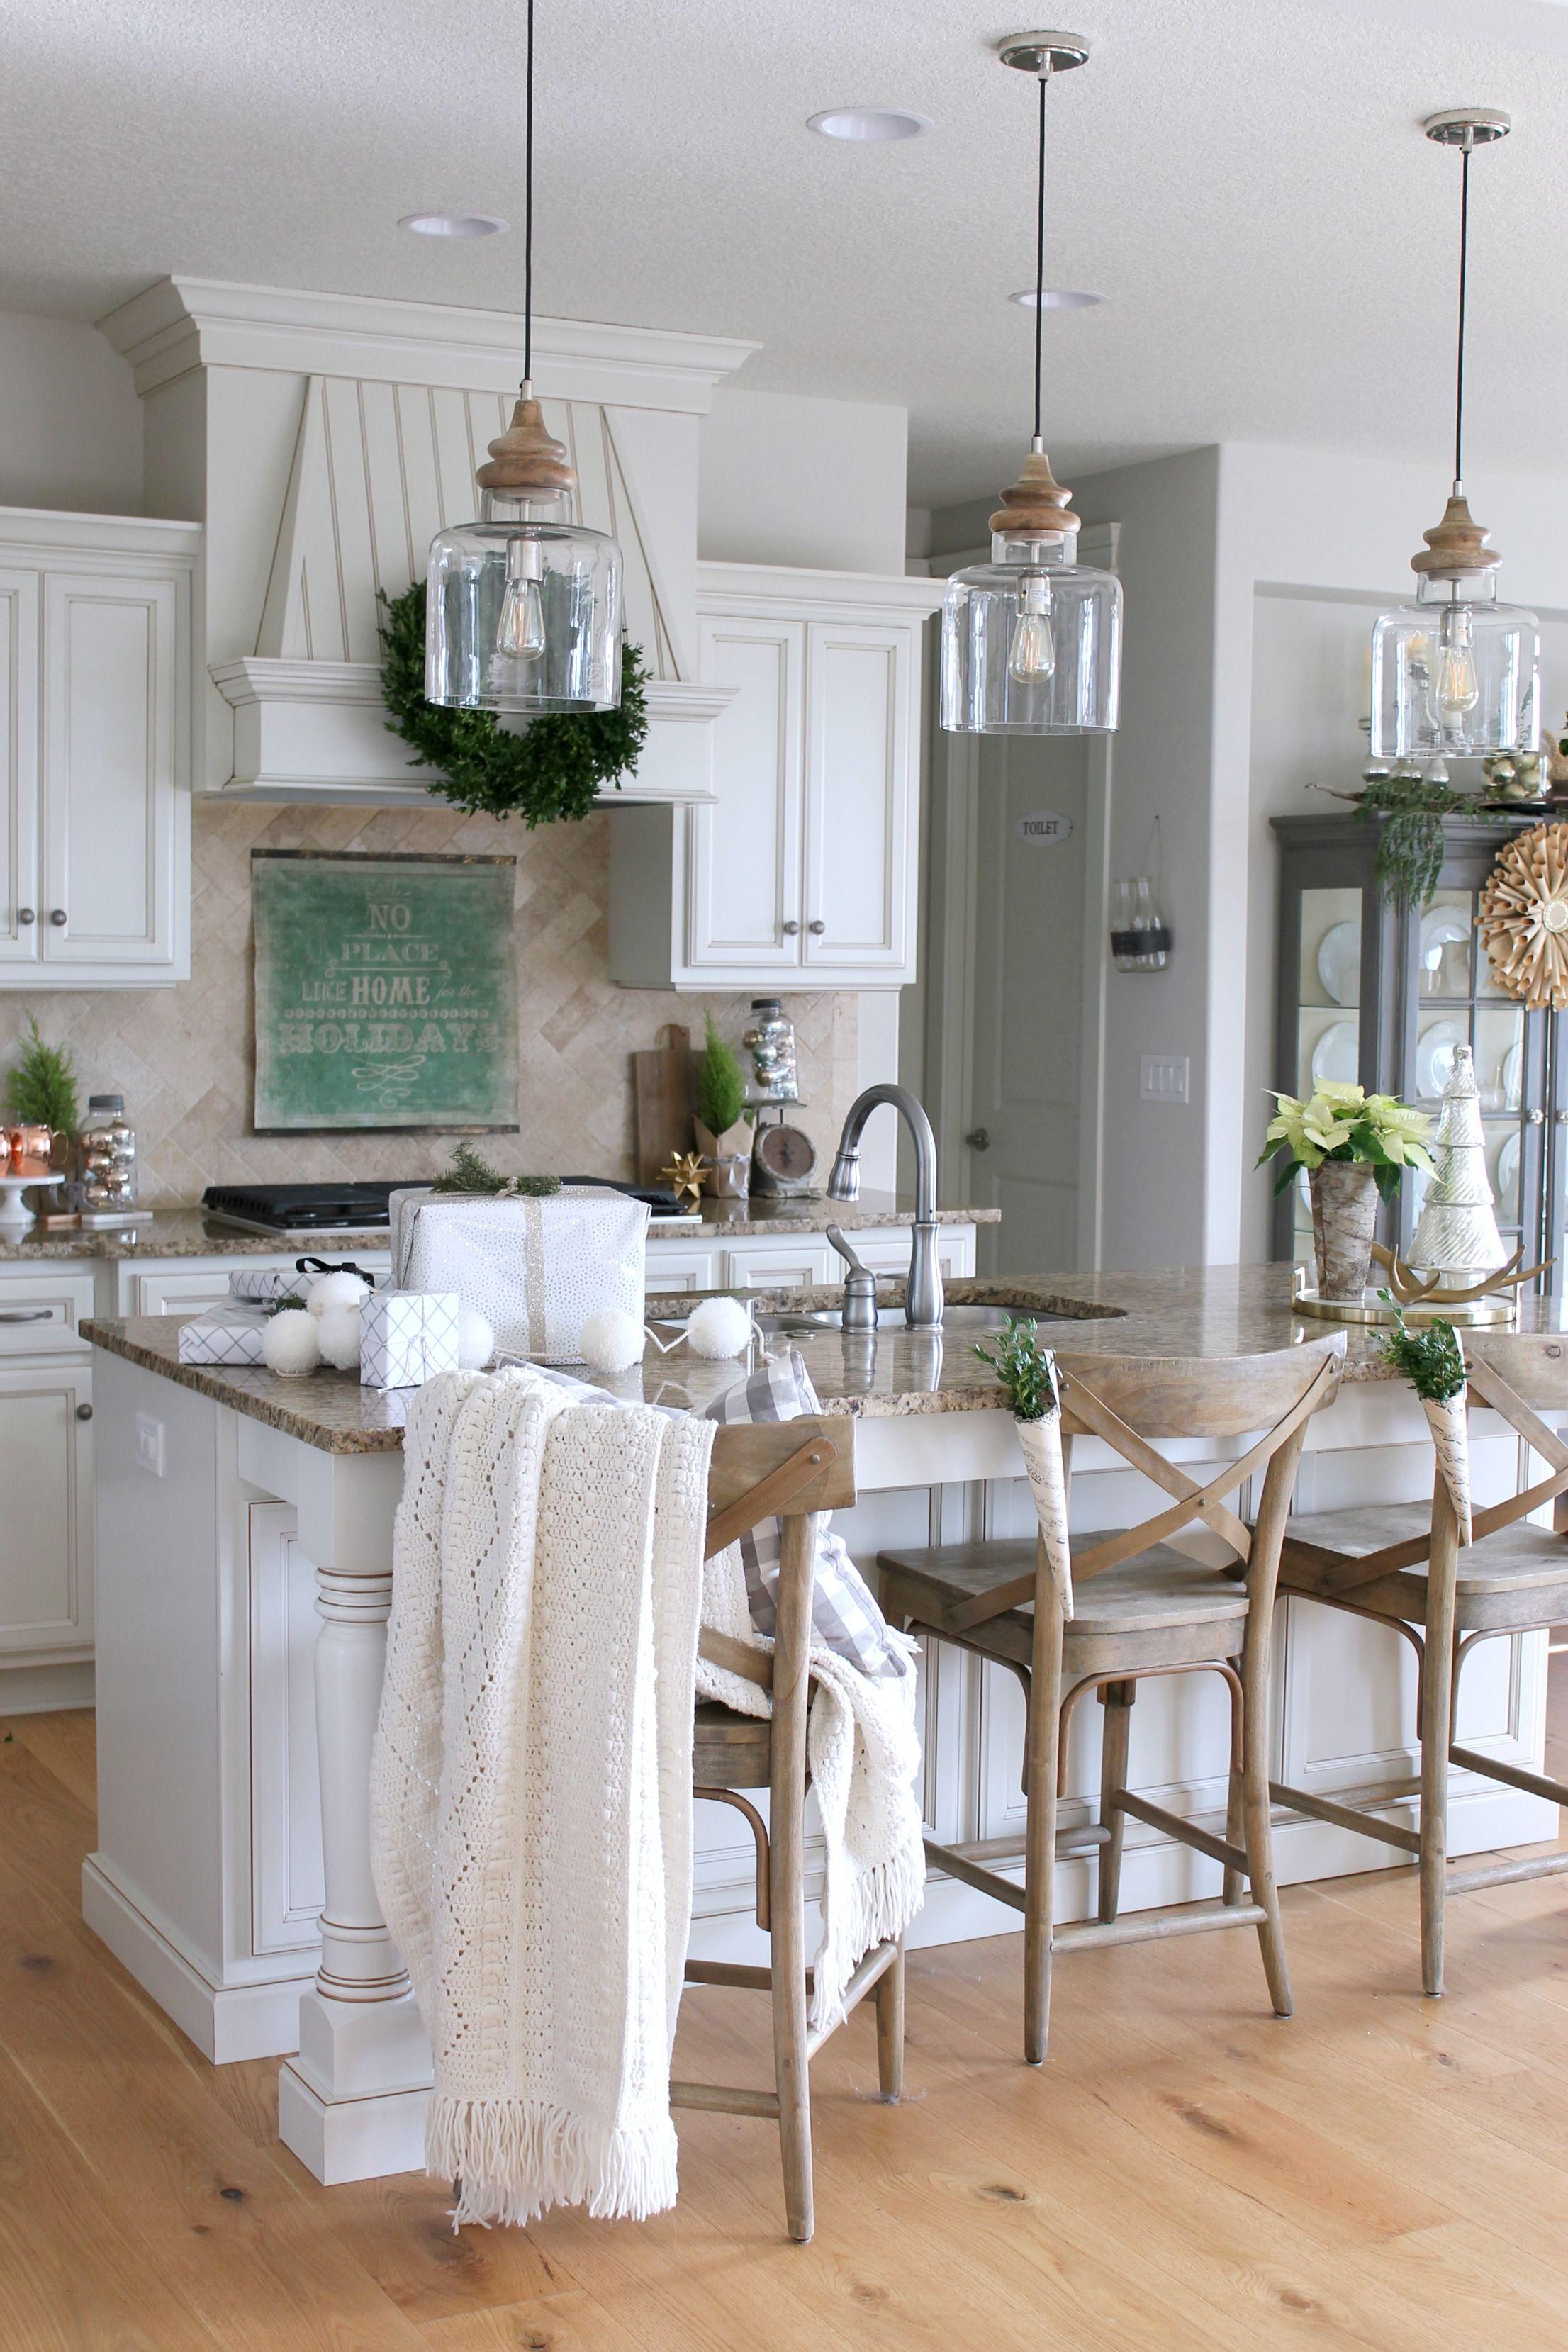 kitchen pendant lighting new farmhouse style island pendant lights - chic california GXLQWZN